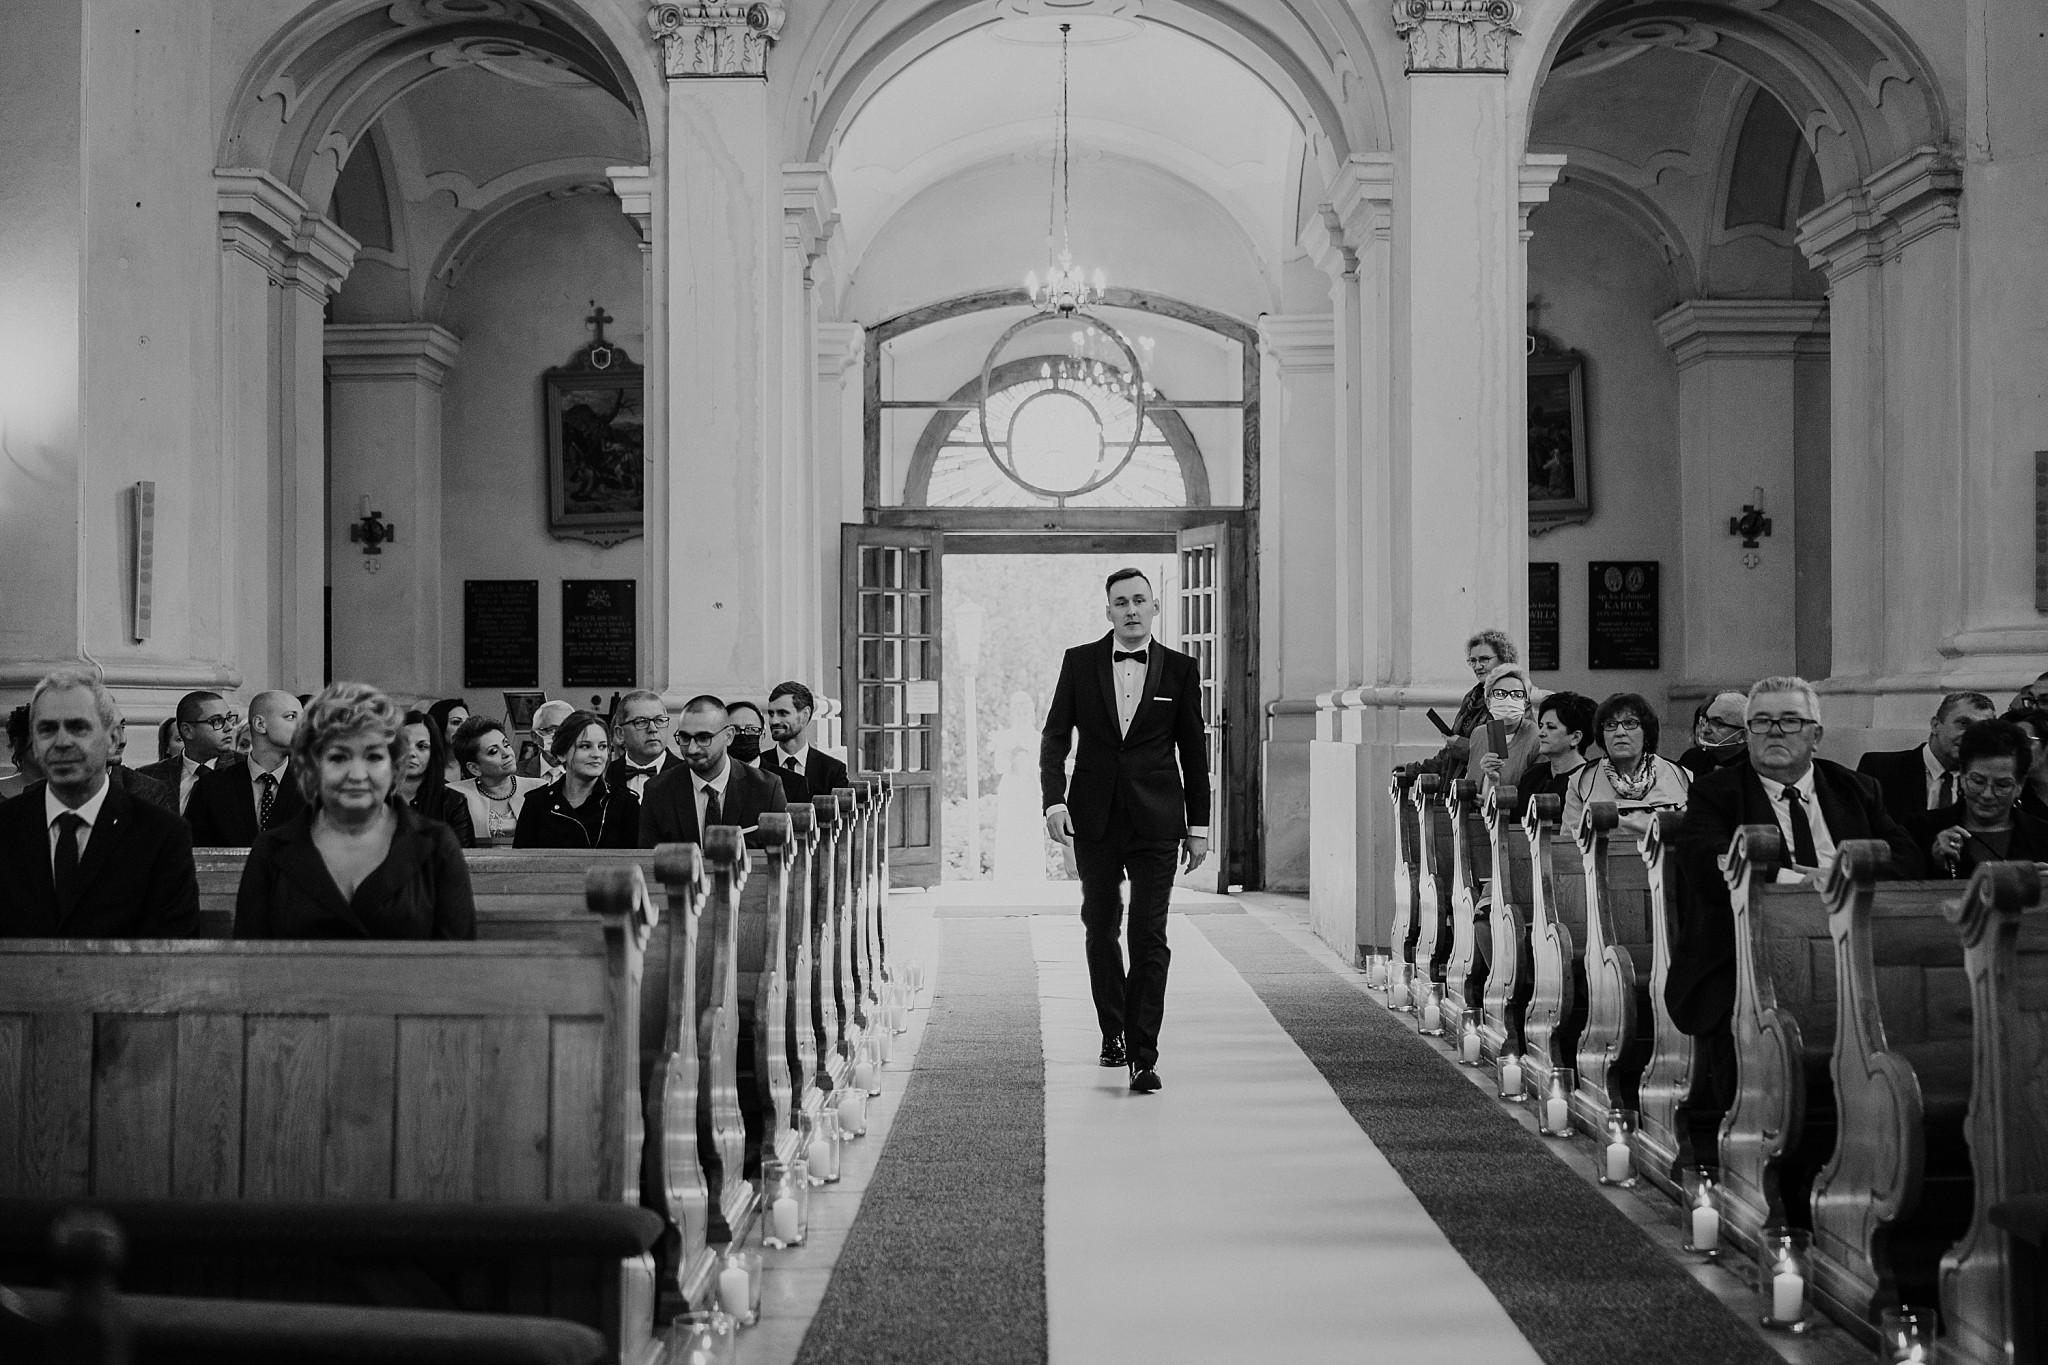 fotograf poznan wesele dobra truskawka piekne wesele pod poznaniem wesele w dobrej truskawce piekna para mloda slub marzen slub koronawirus slub listopad wesele koronawirus 142